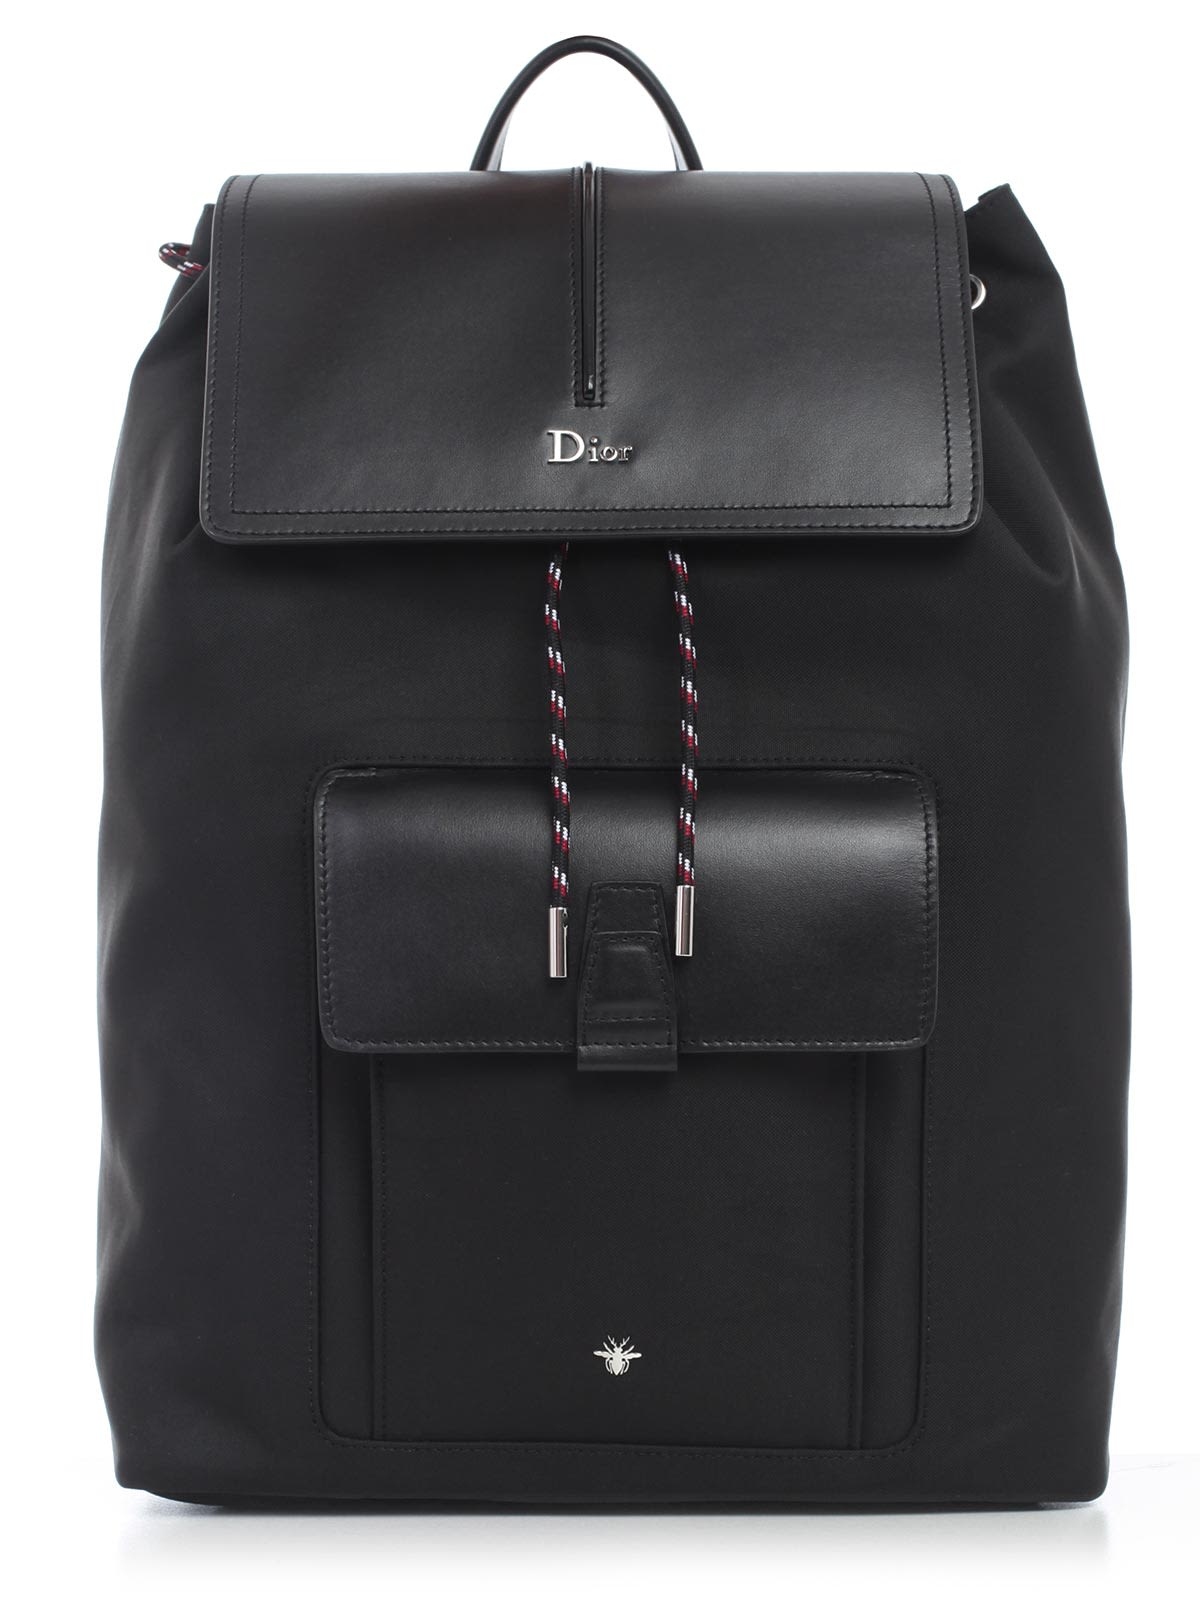 DIOR HOMME Flap Backpack, 15E Black Multicolor